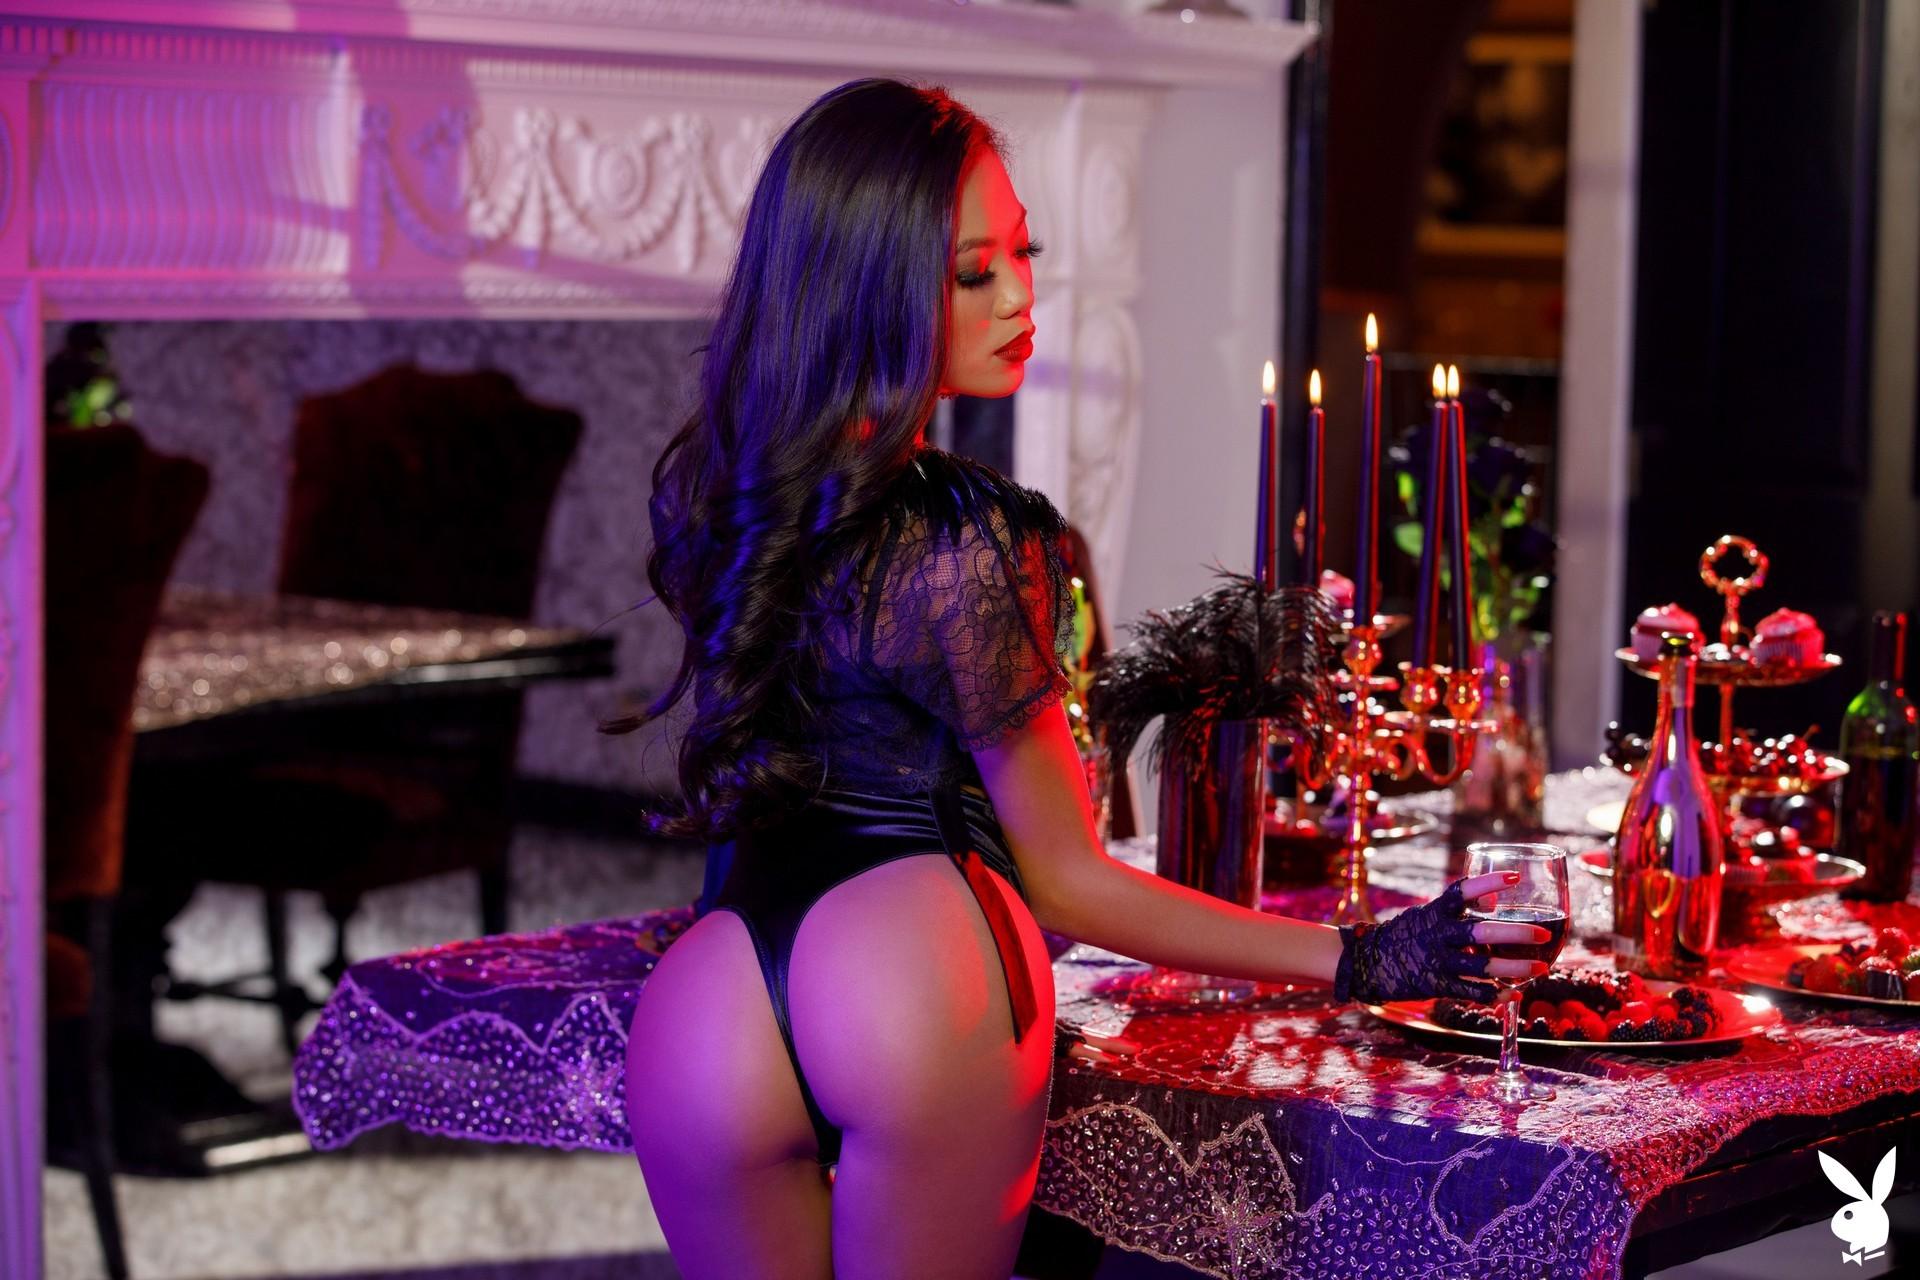 Vina Sky In Midnight Indulgence Playboy Plus (5)